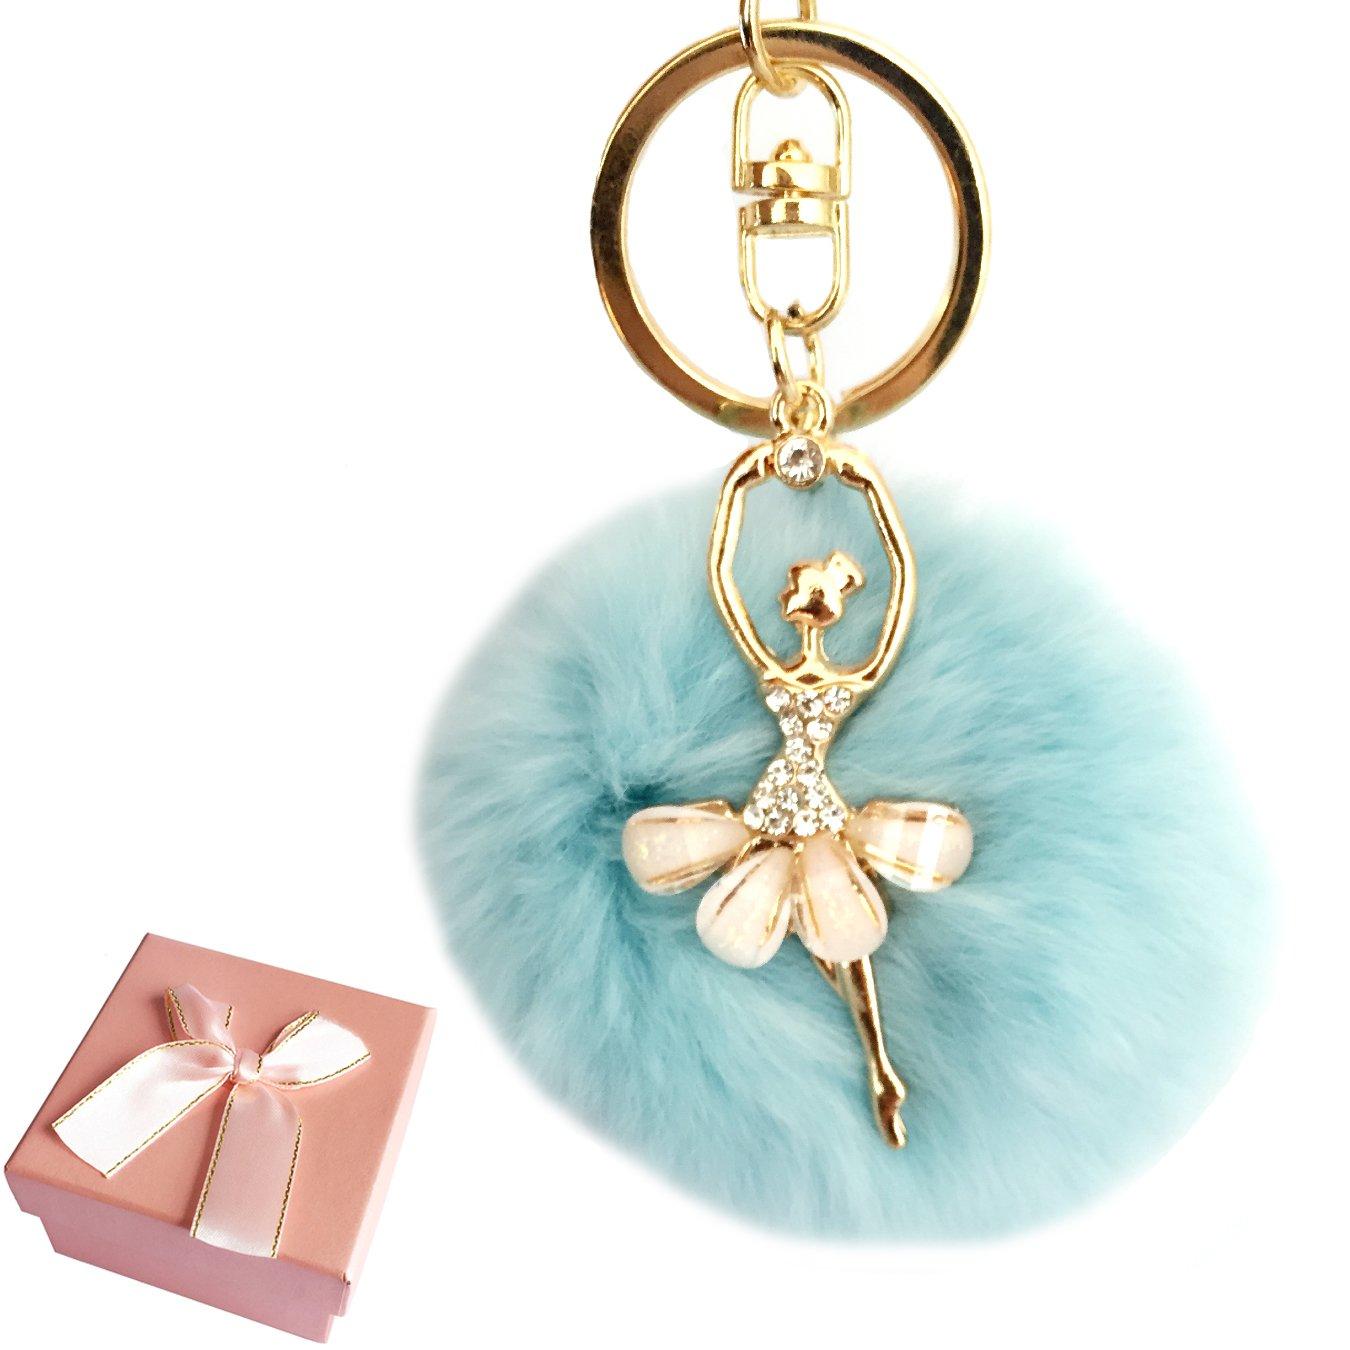 Elesa Miracle Girl Women Fur Ball Rhinestone Ballerina Keychain, Ballet Dancing Girl Handbag Accessories, Car Key Chain (Sky Blue)